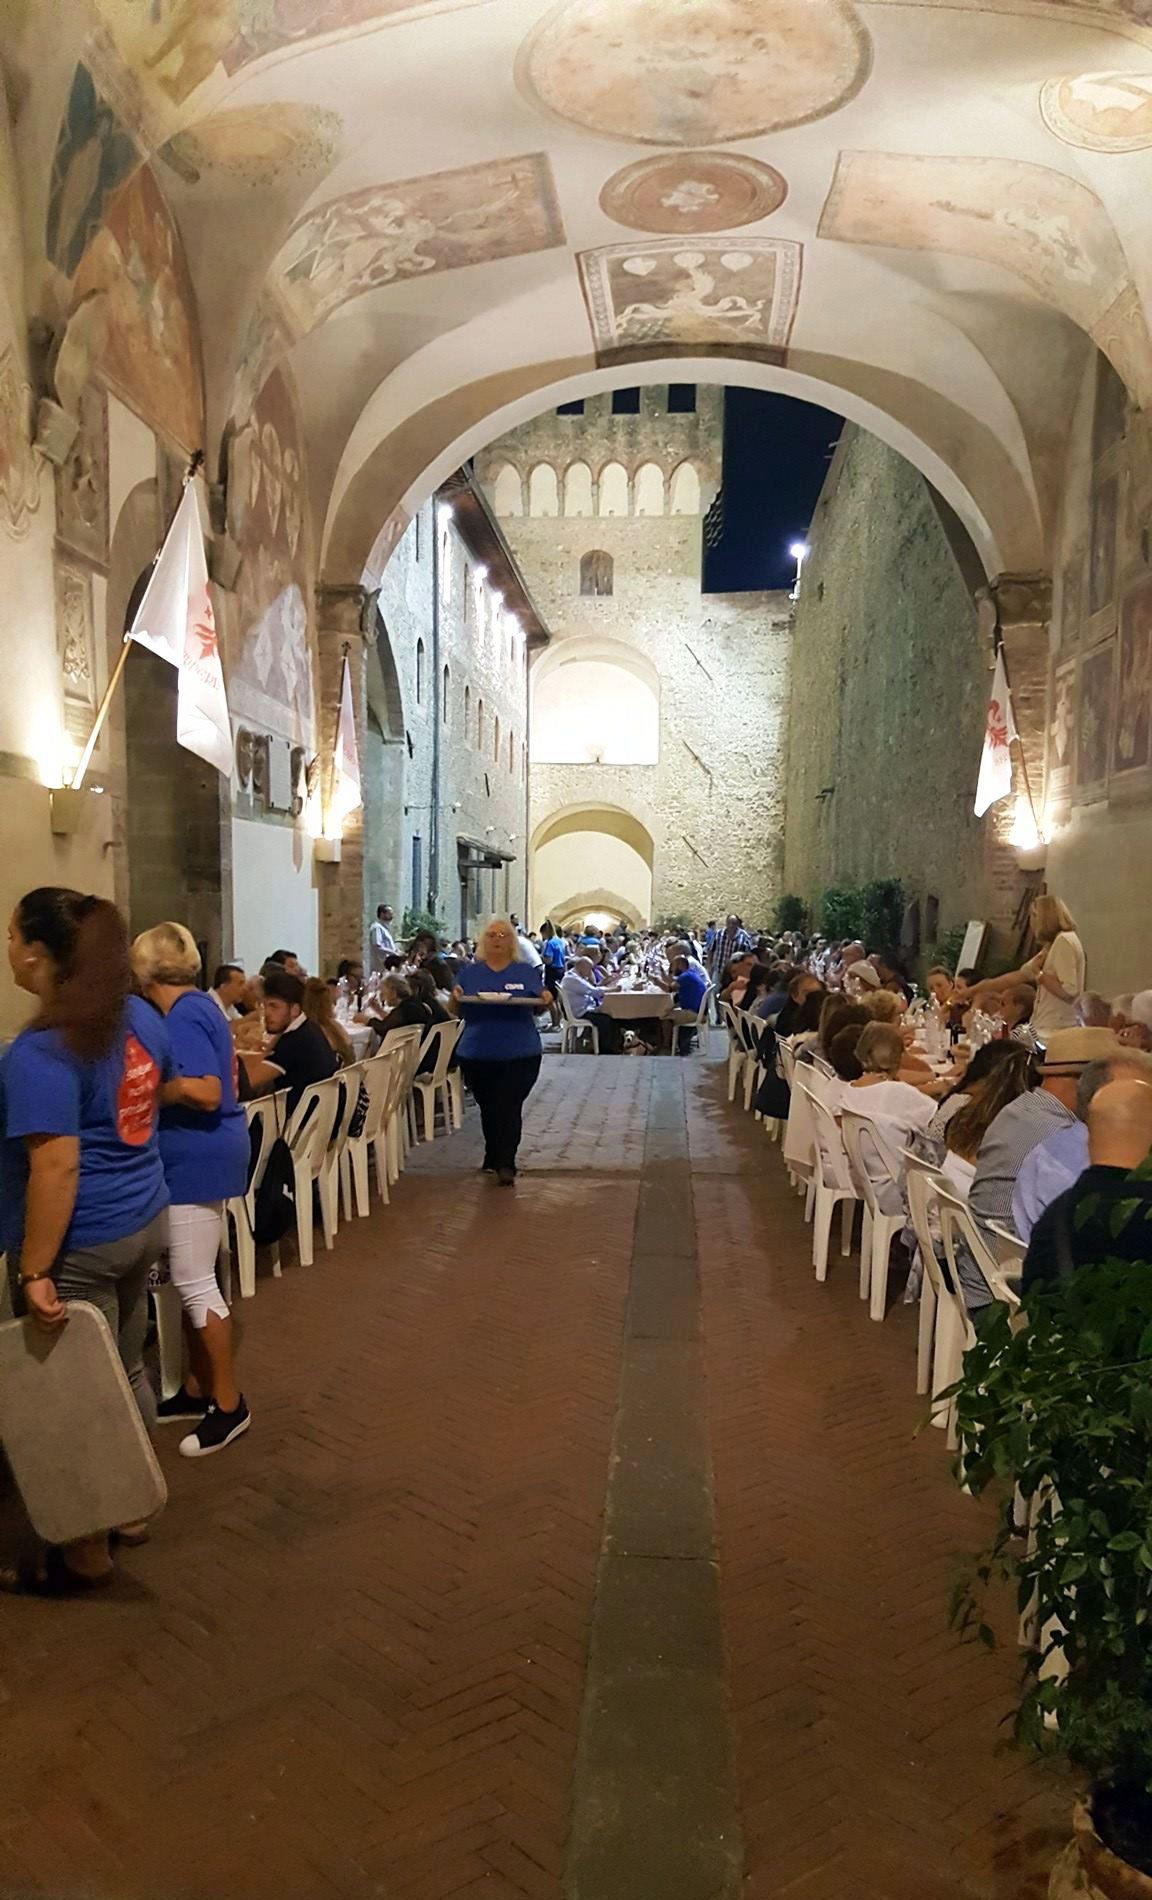 scarperia-a-tavola-misericordia-2016-3